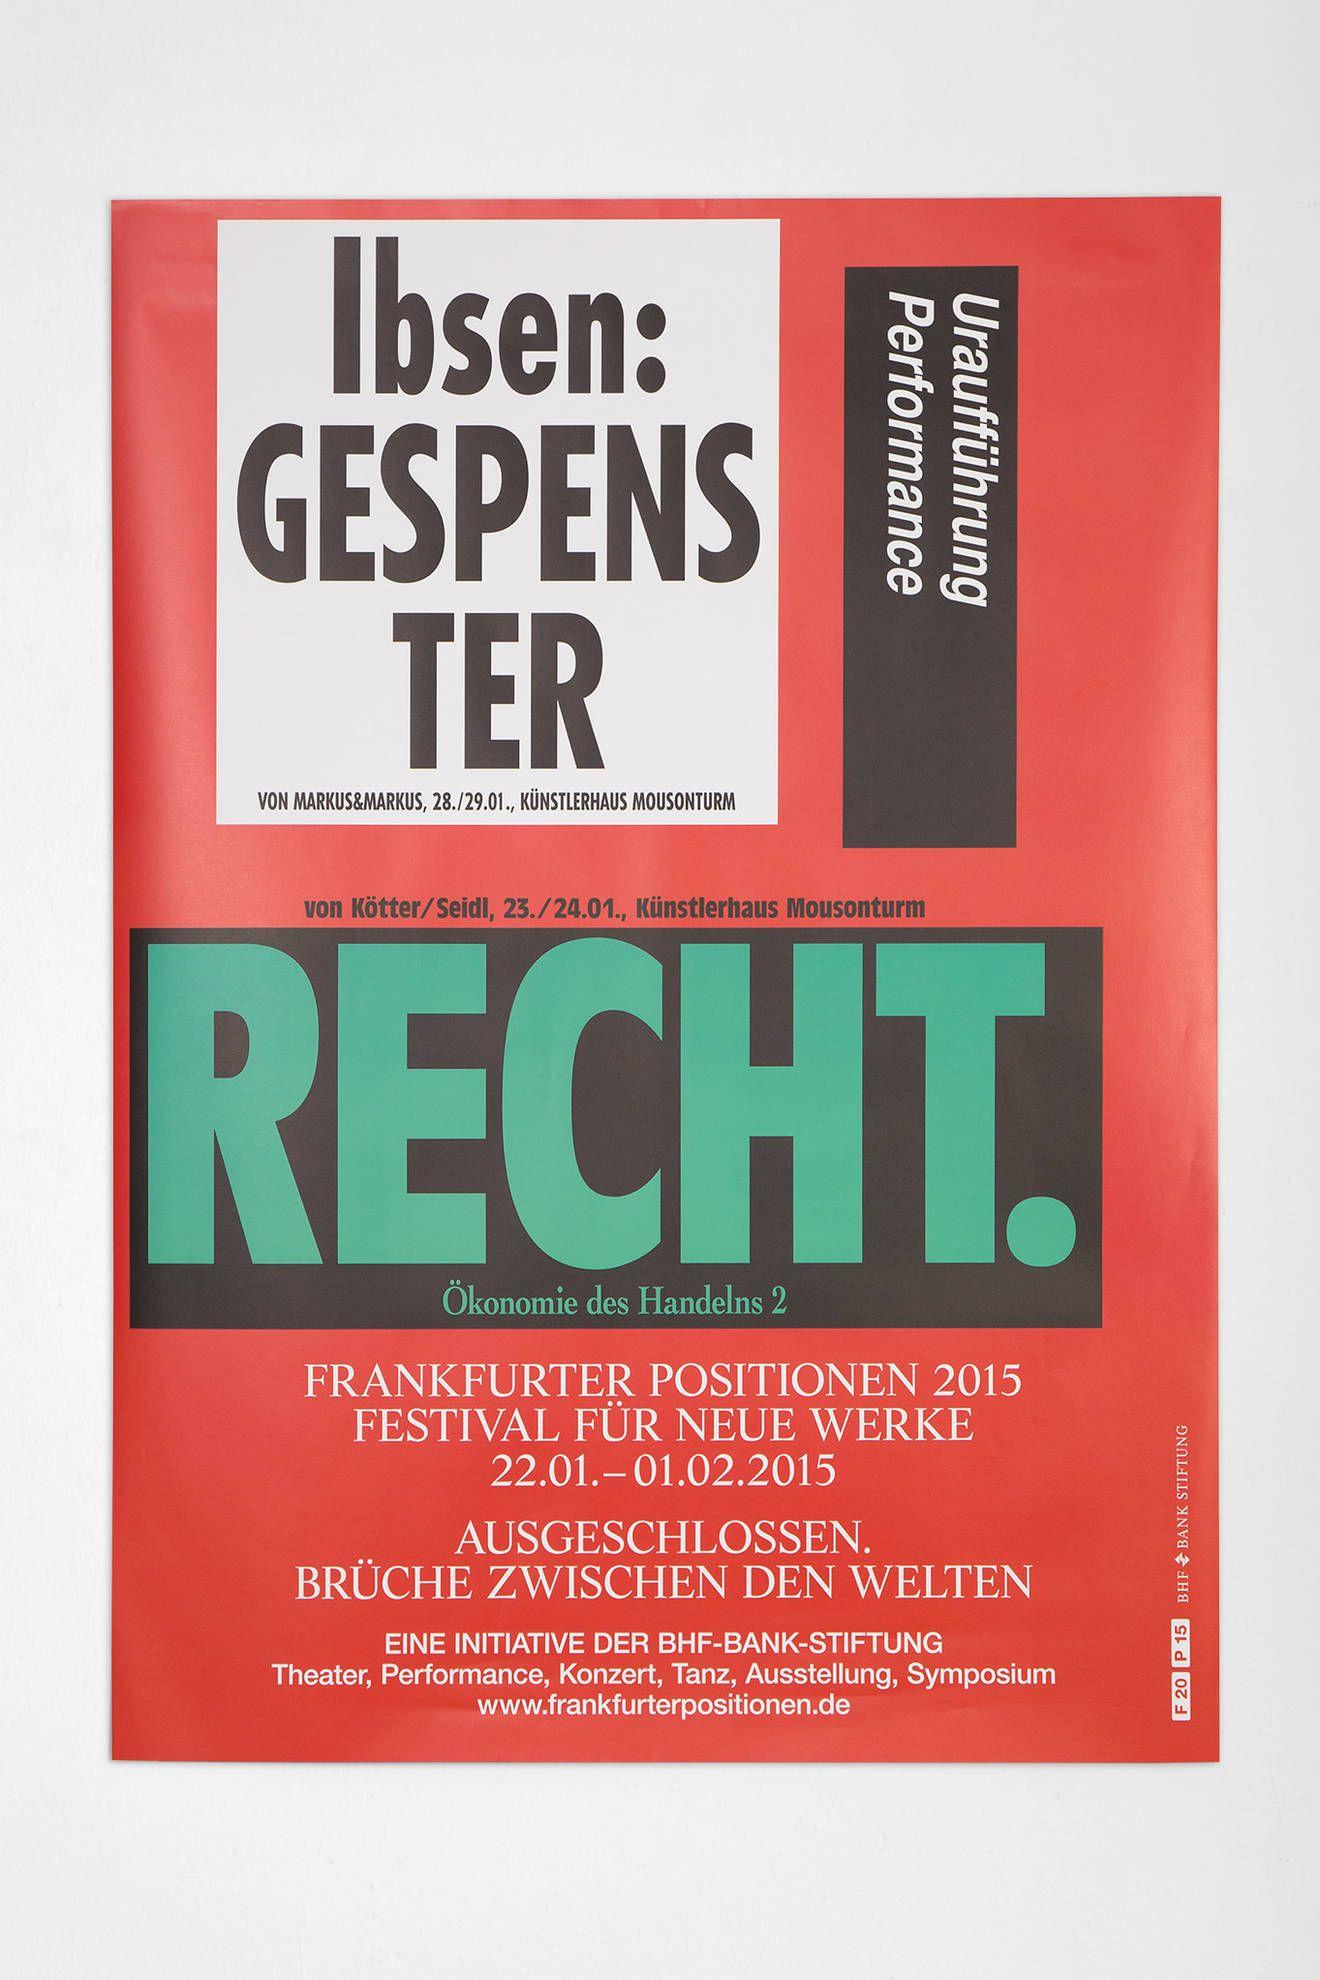 Hort Hagelberger Str 52 Hh 10965 Berlin 49 0 30 81828108 Contact Hort Org Uk Book Cover Grafic Design Typography